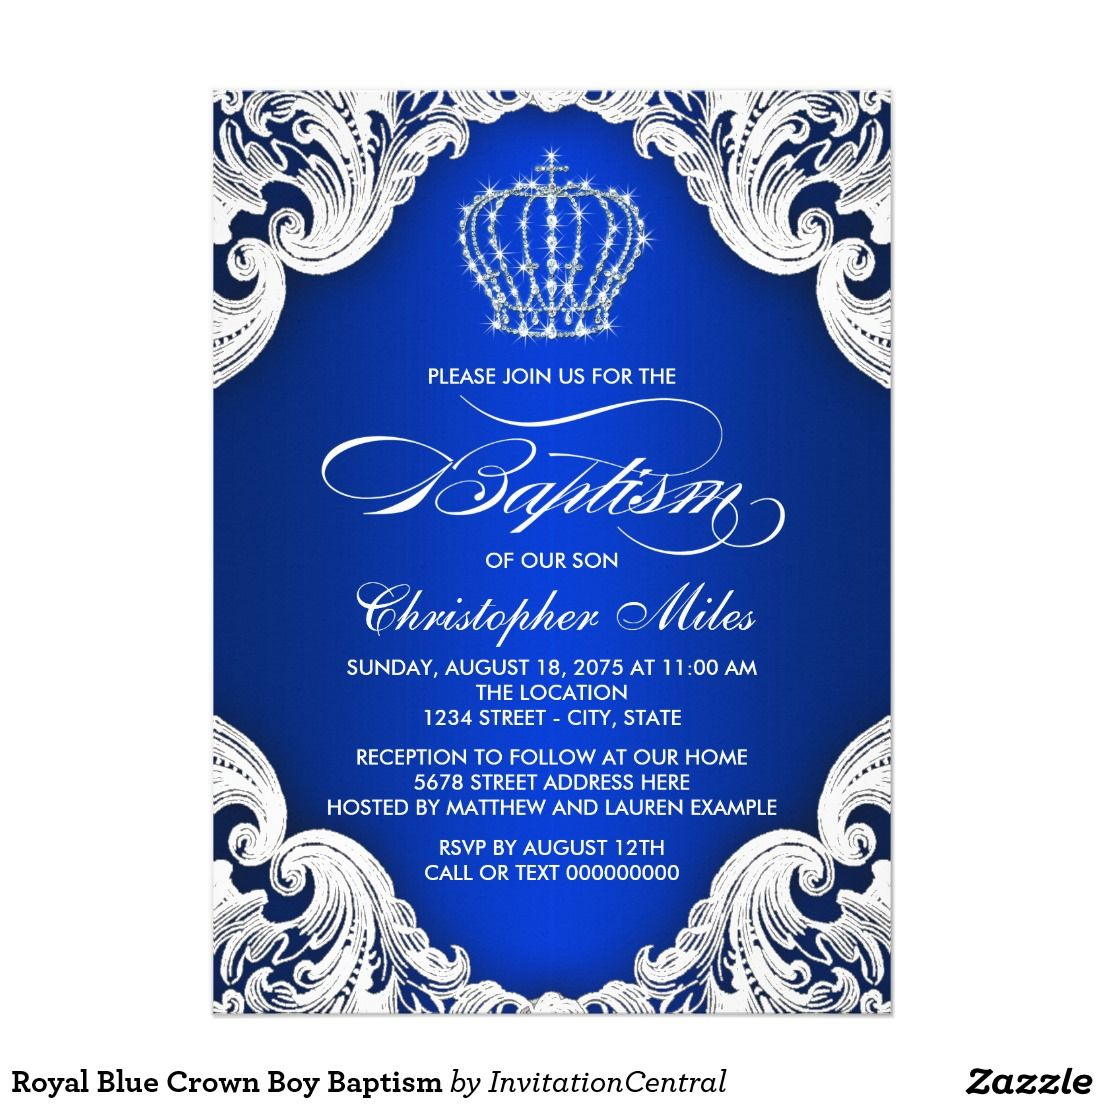 royal blue crown boy baptism invitation